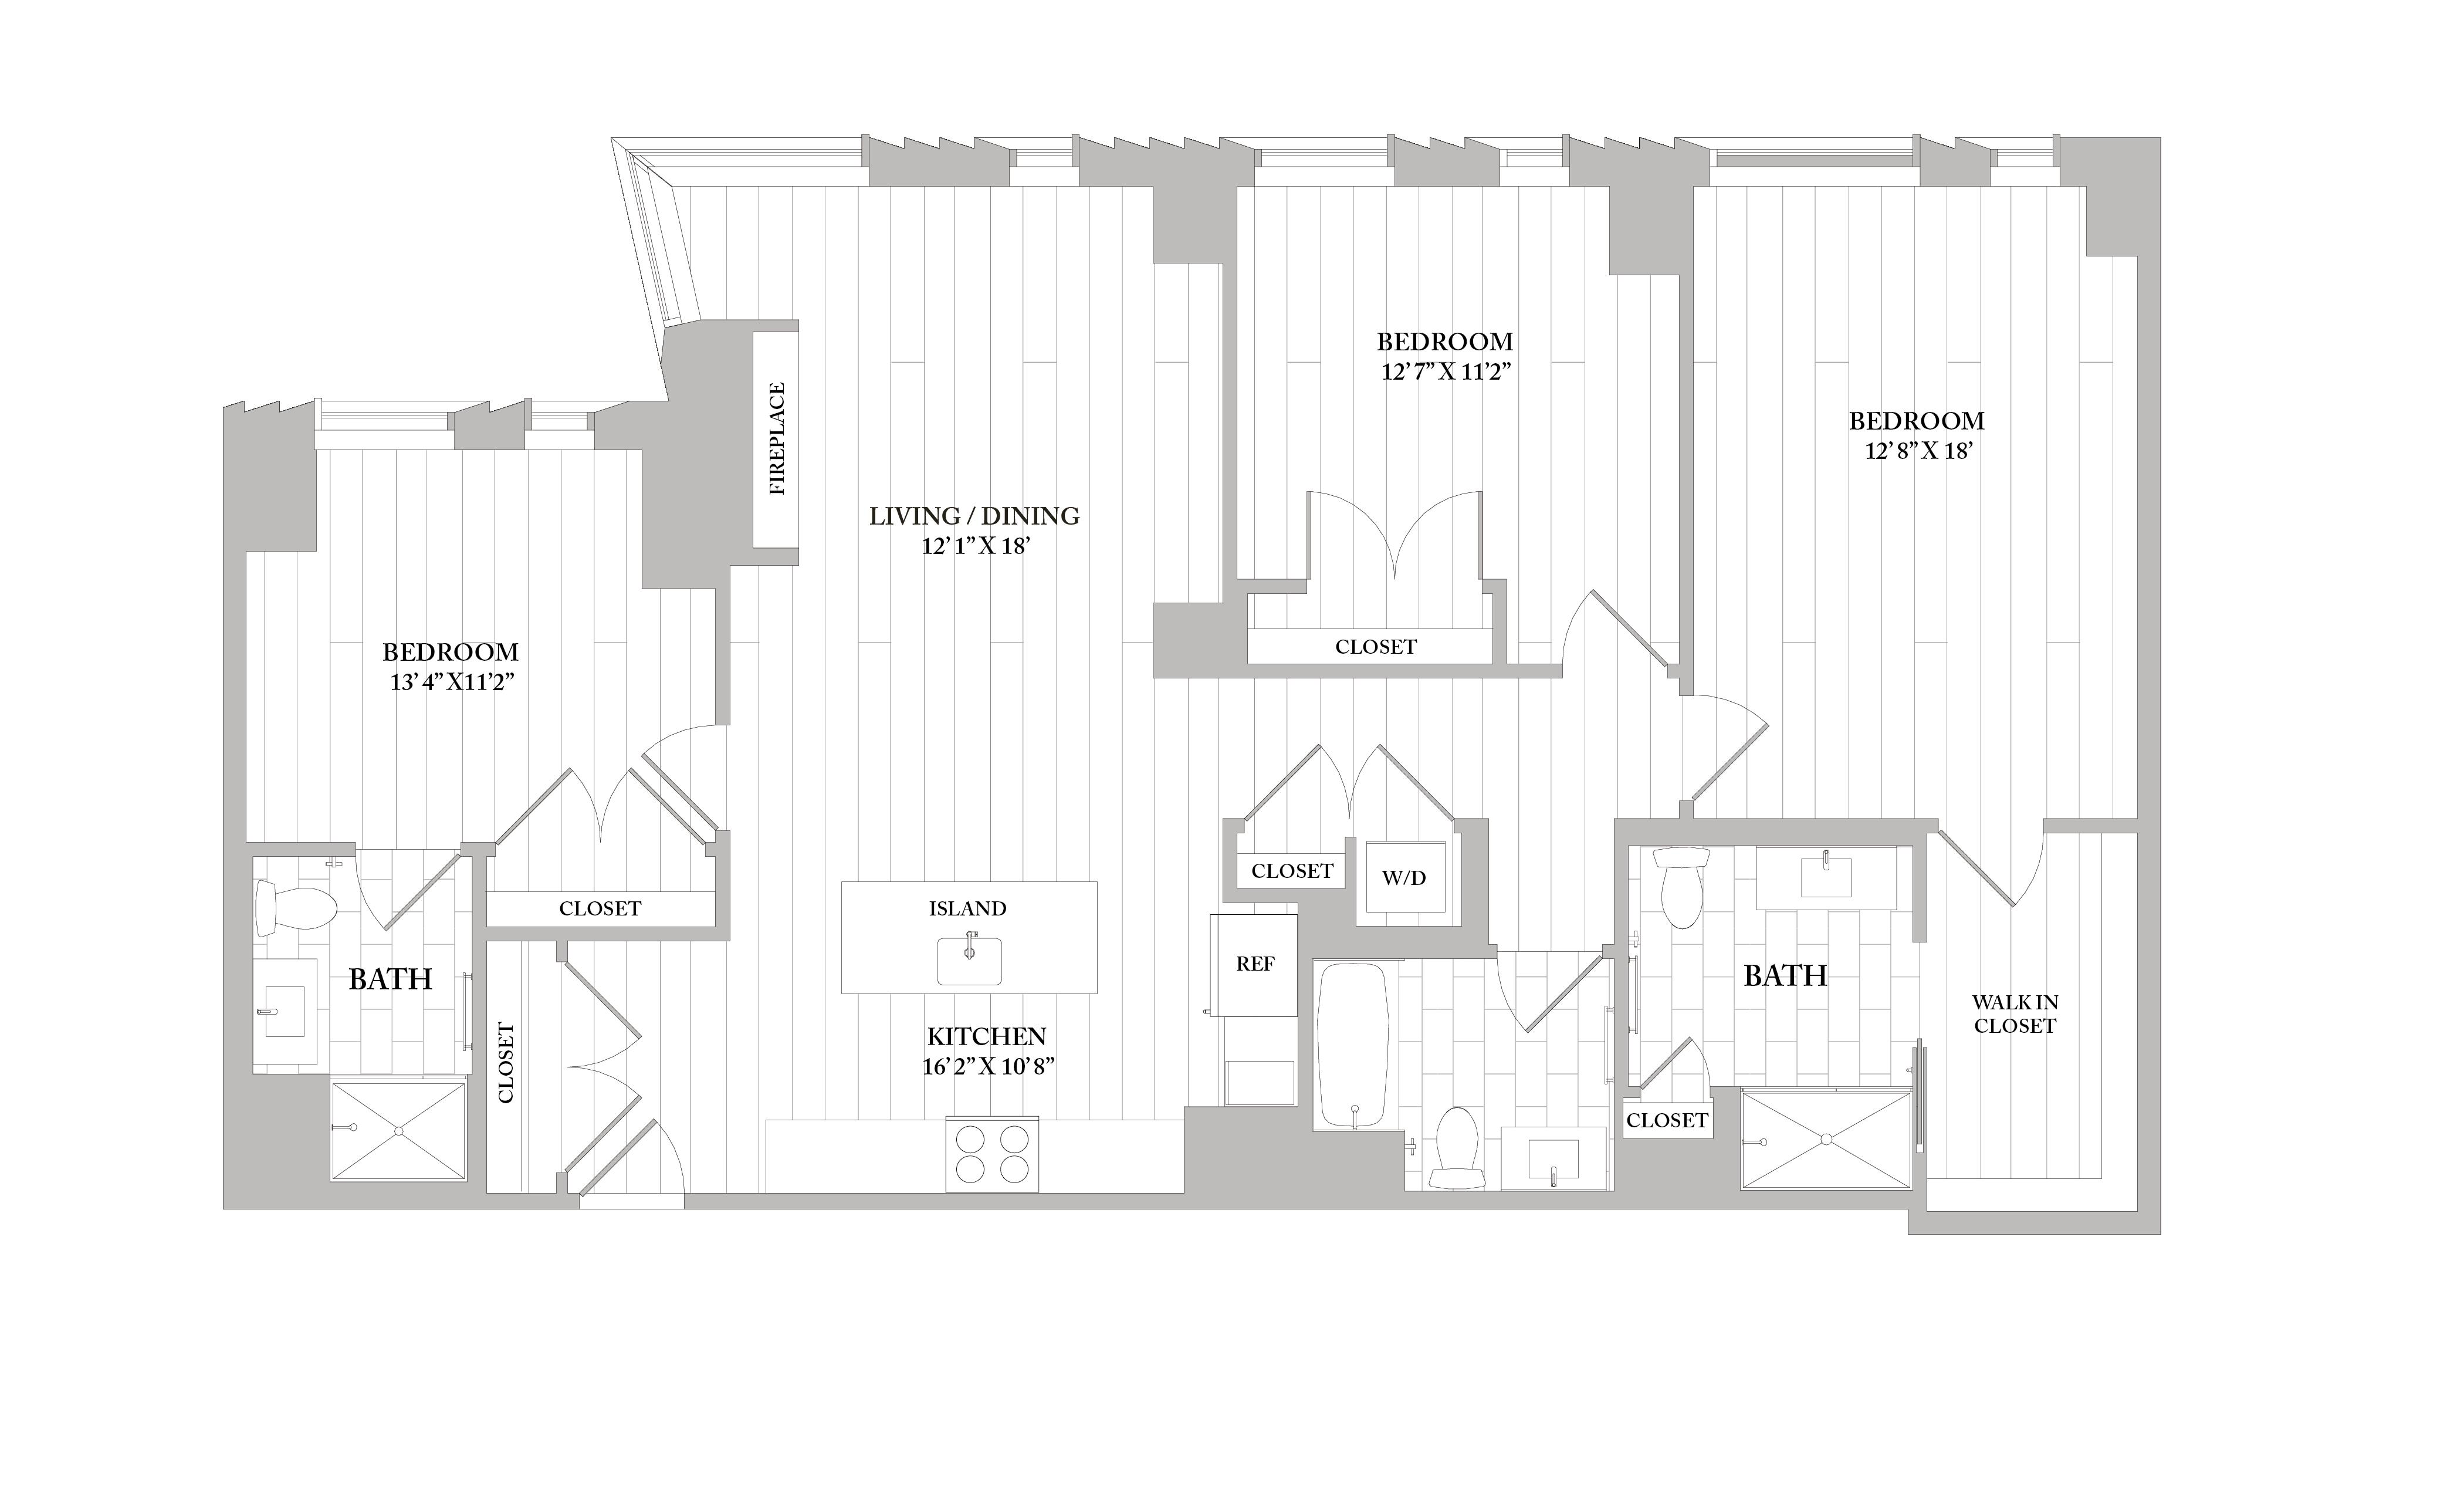 Apartment 3505 floorplan